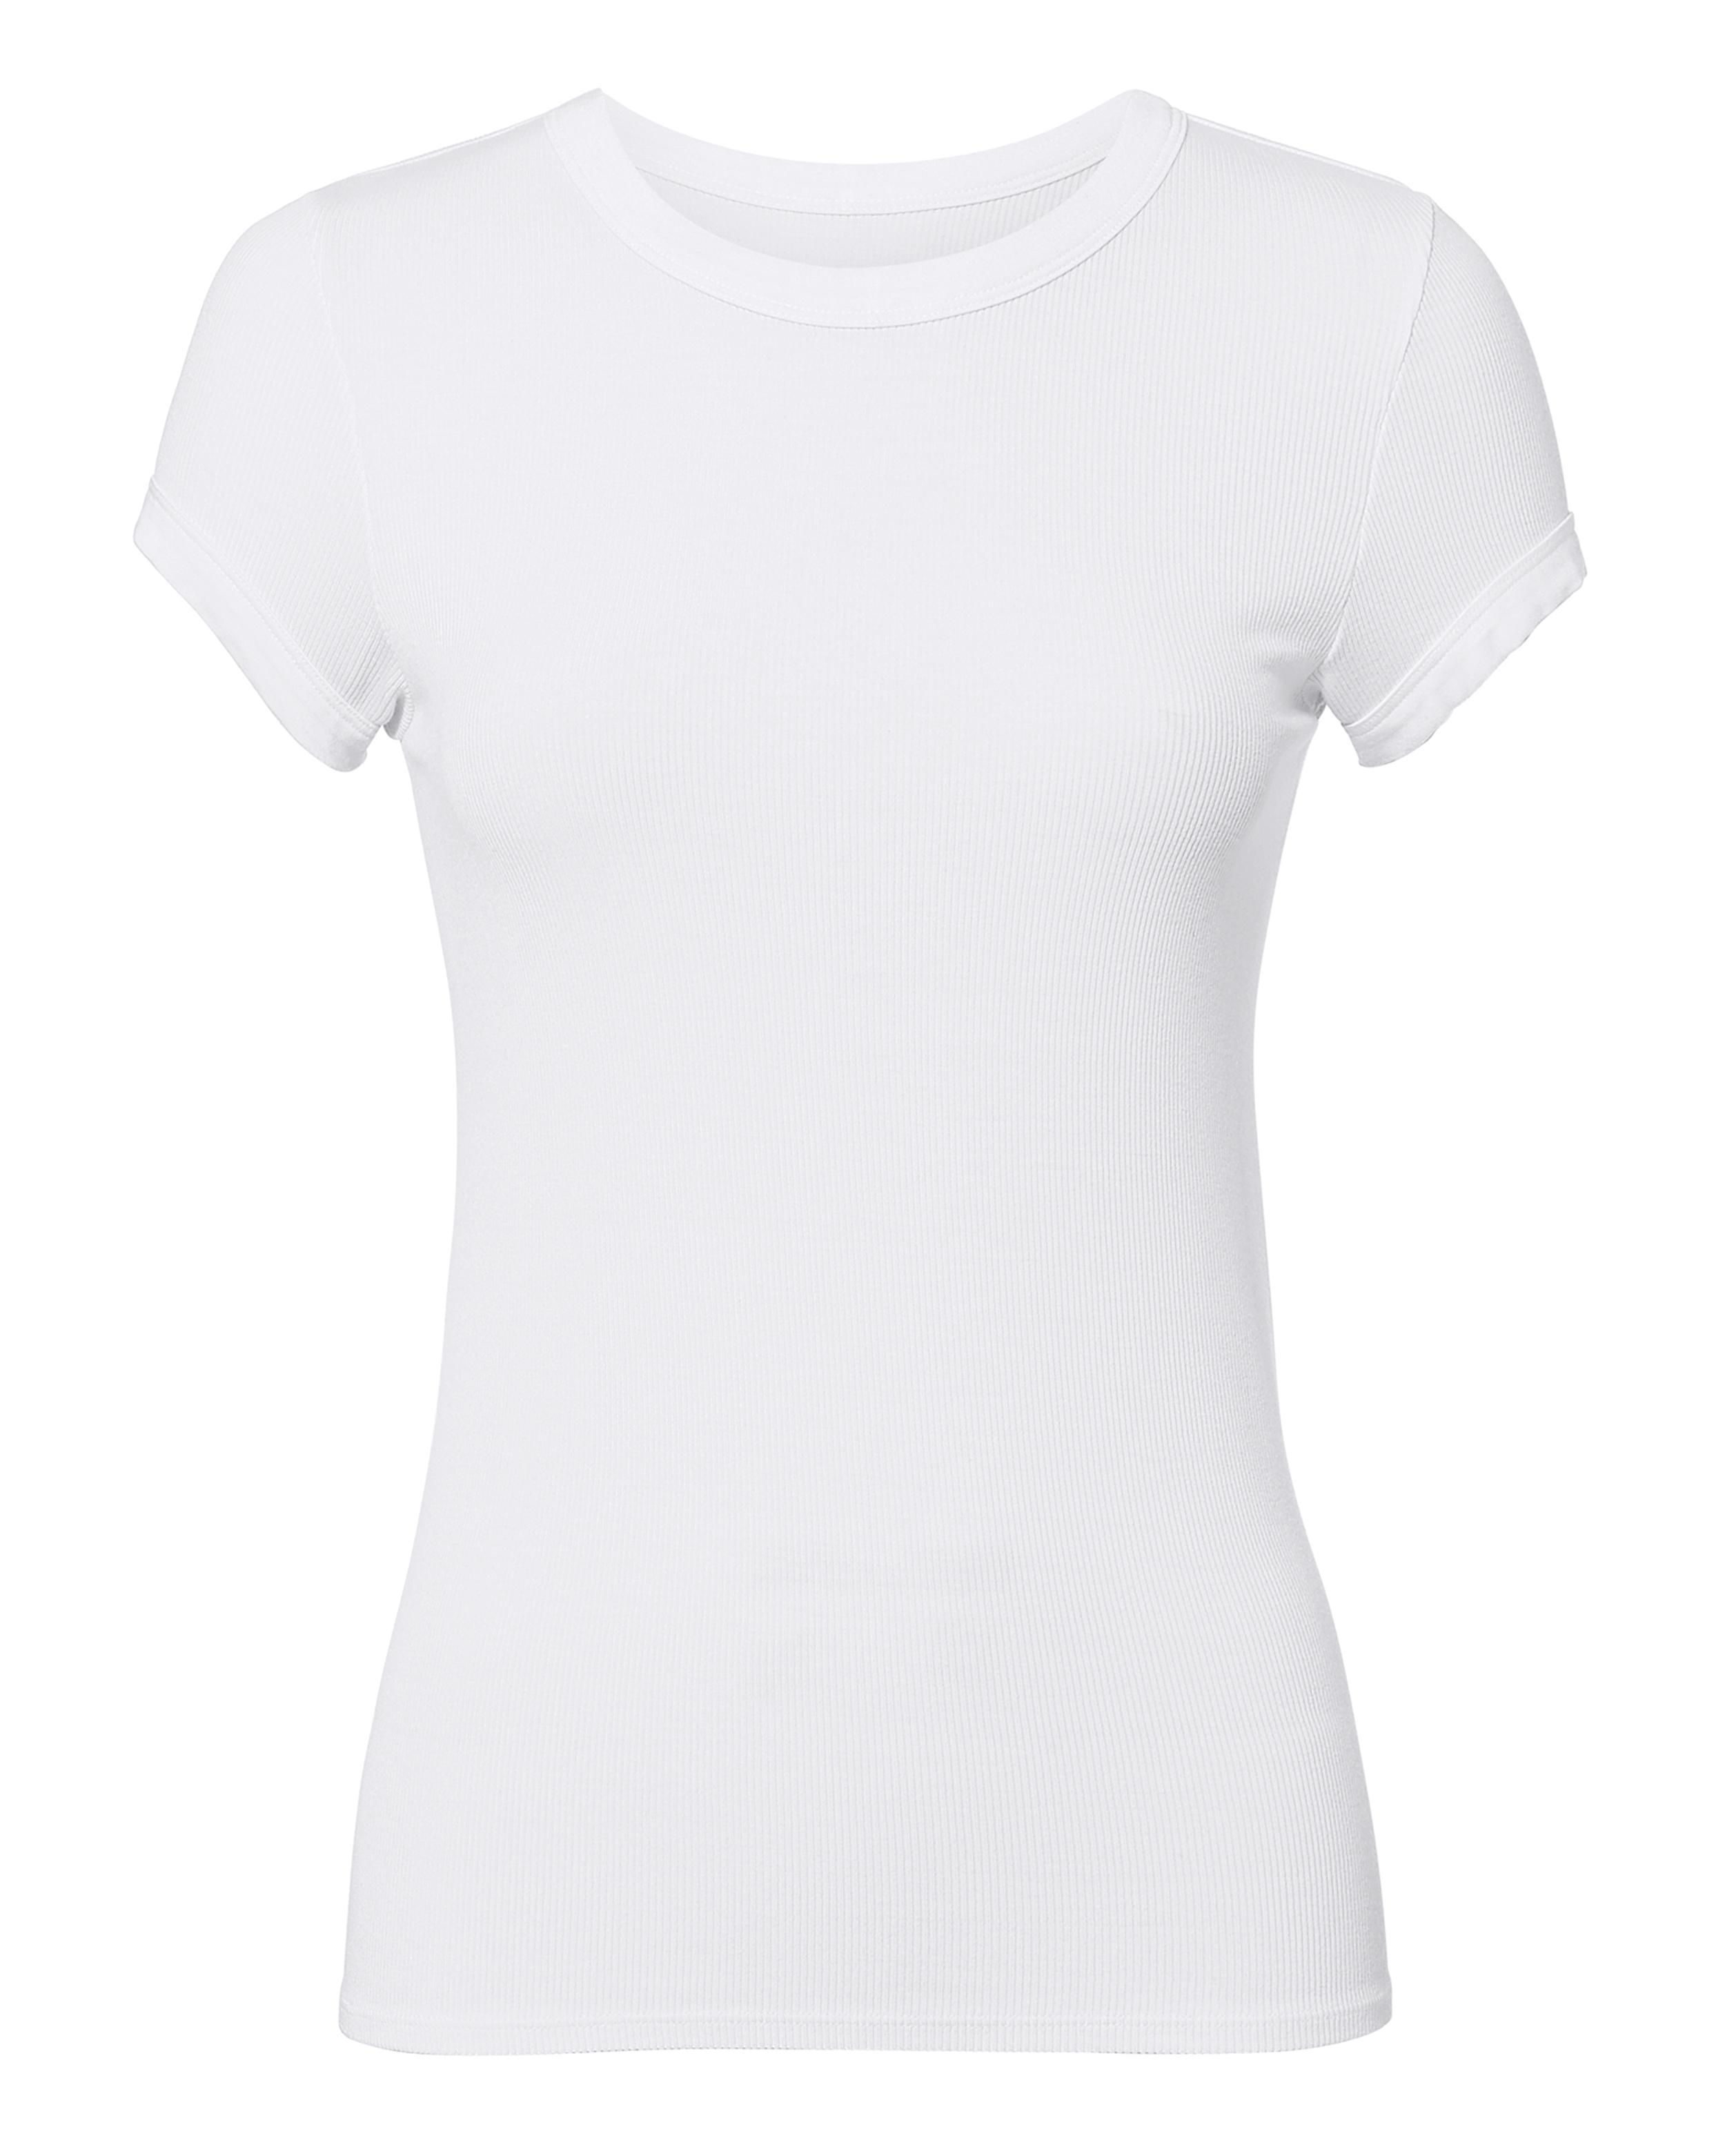 Enza Costa Cap Sleeve Rib White T-shirt